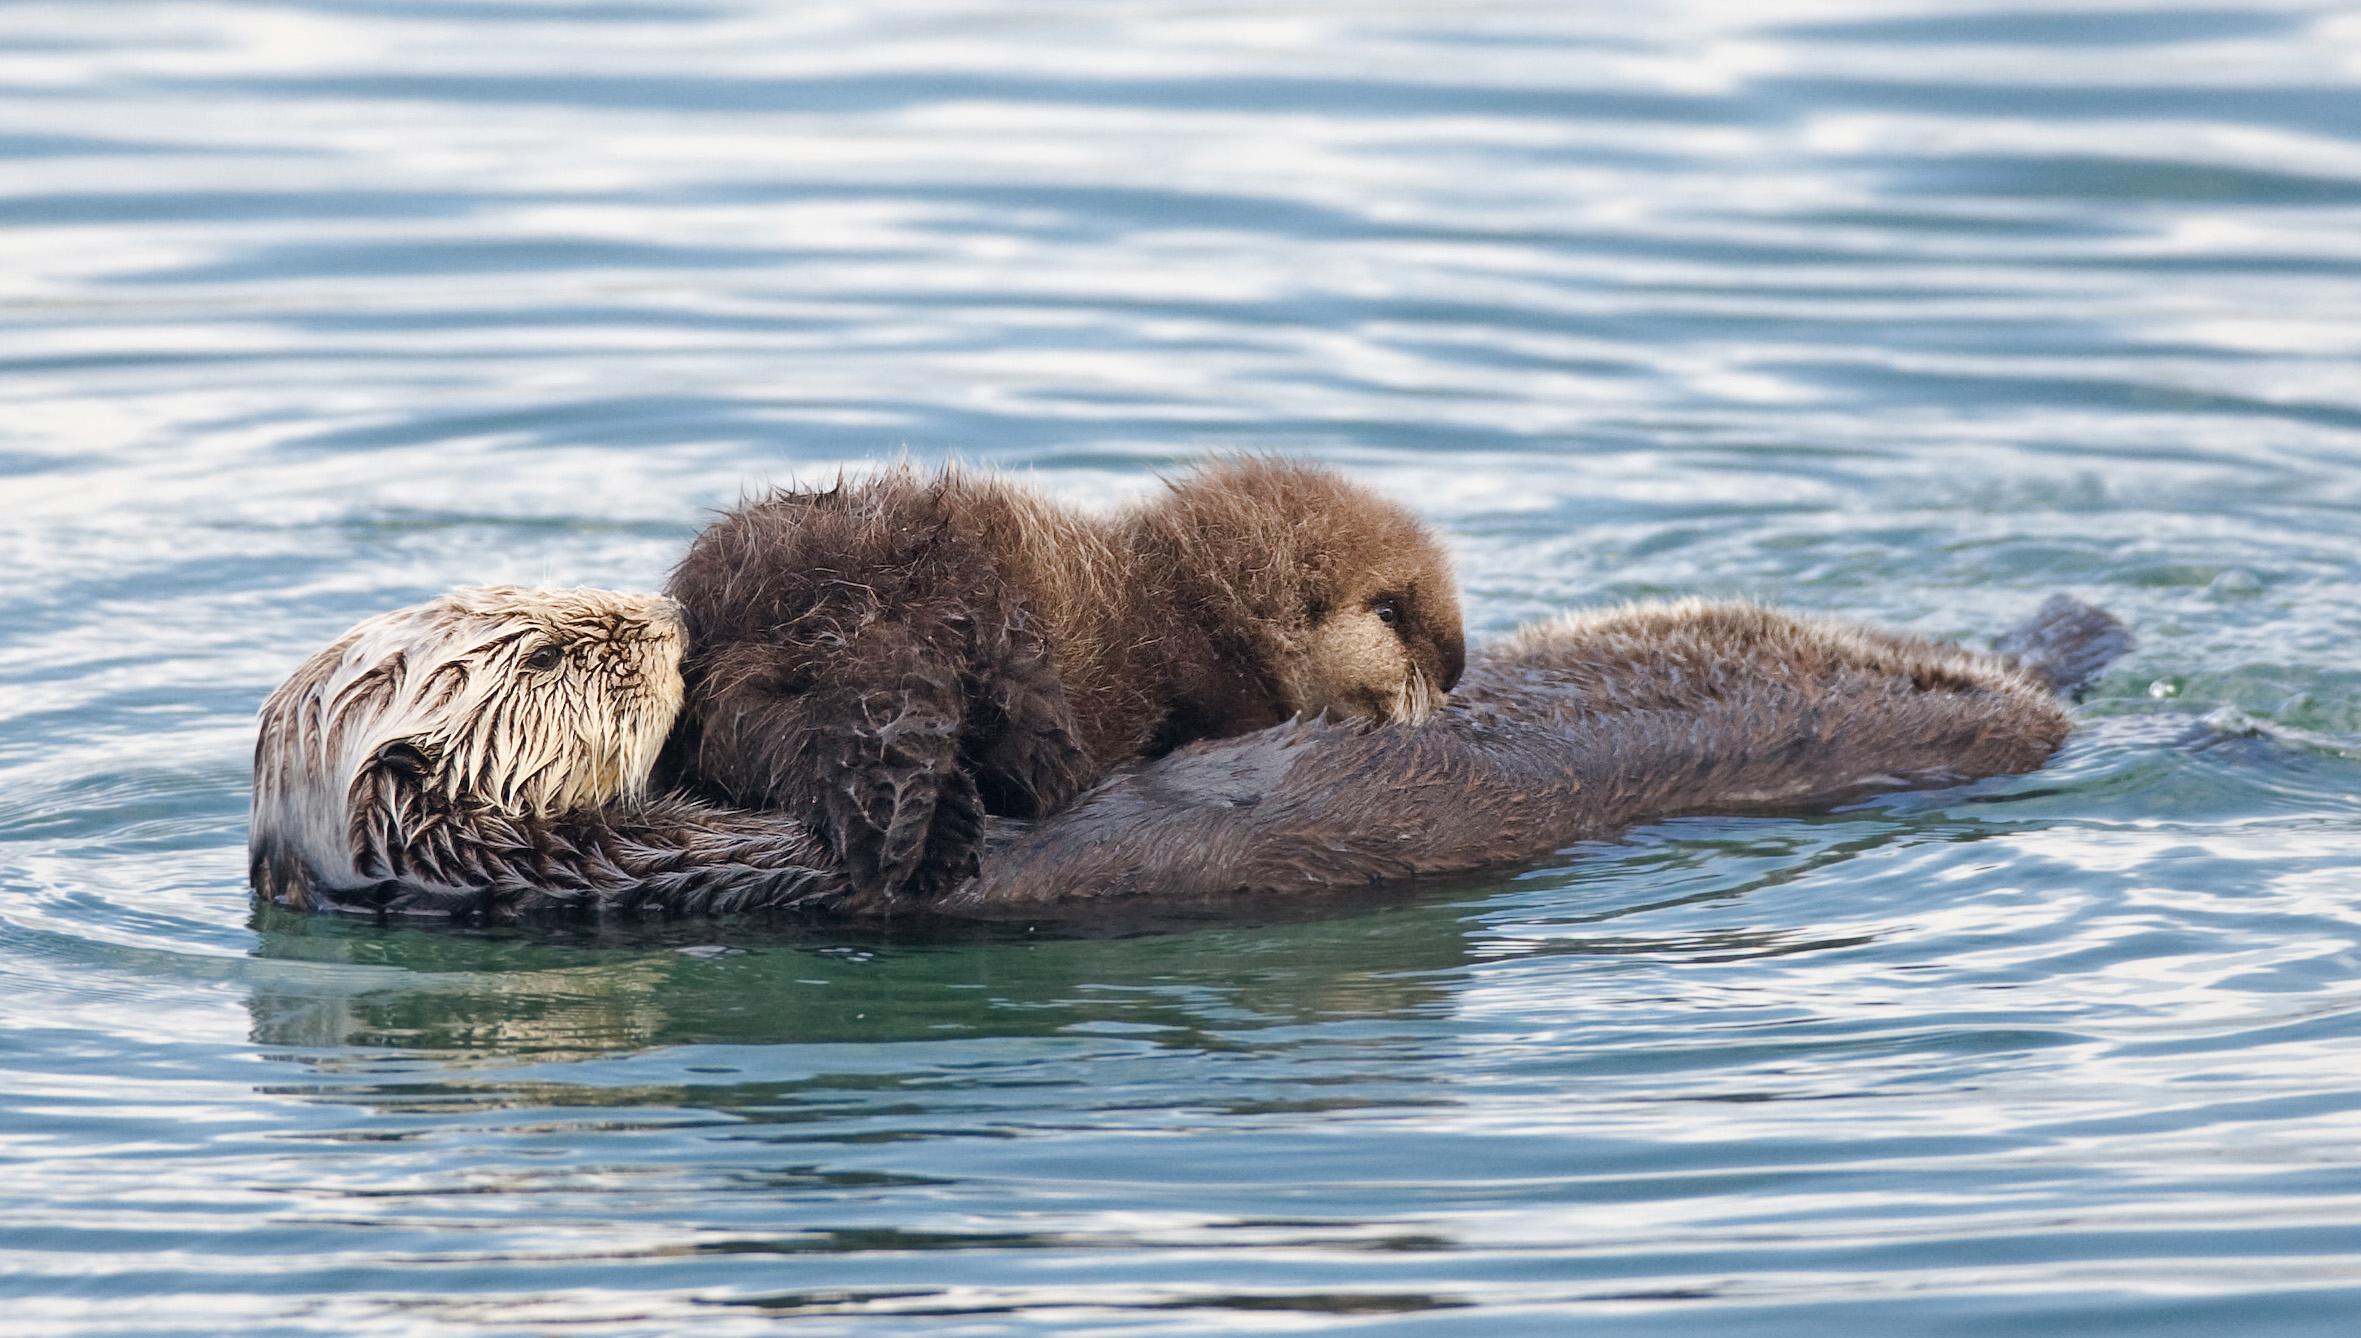 FileSea otter nursing02jpg   Wikimedia Commons 2361x1338